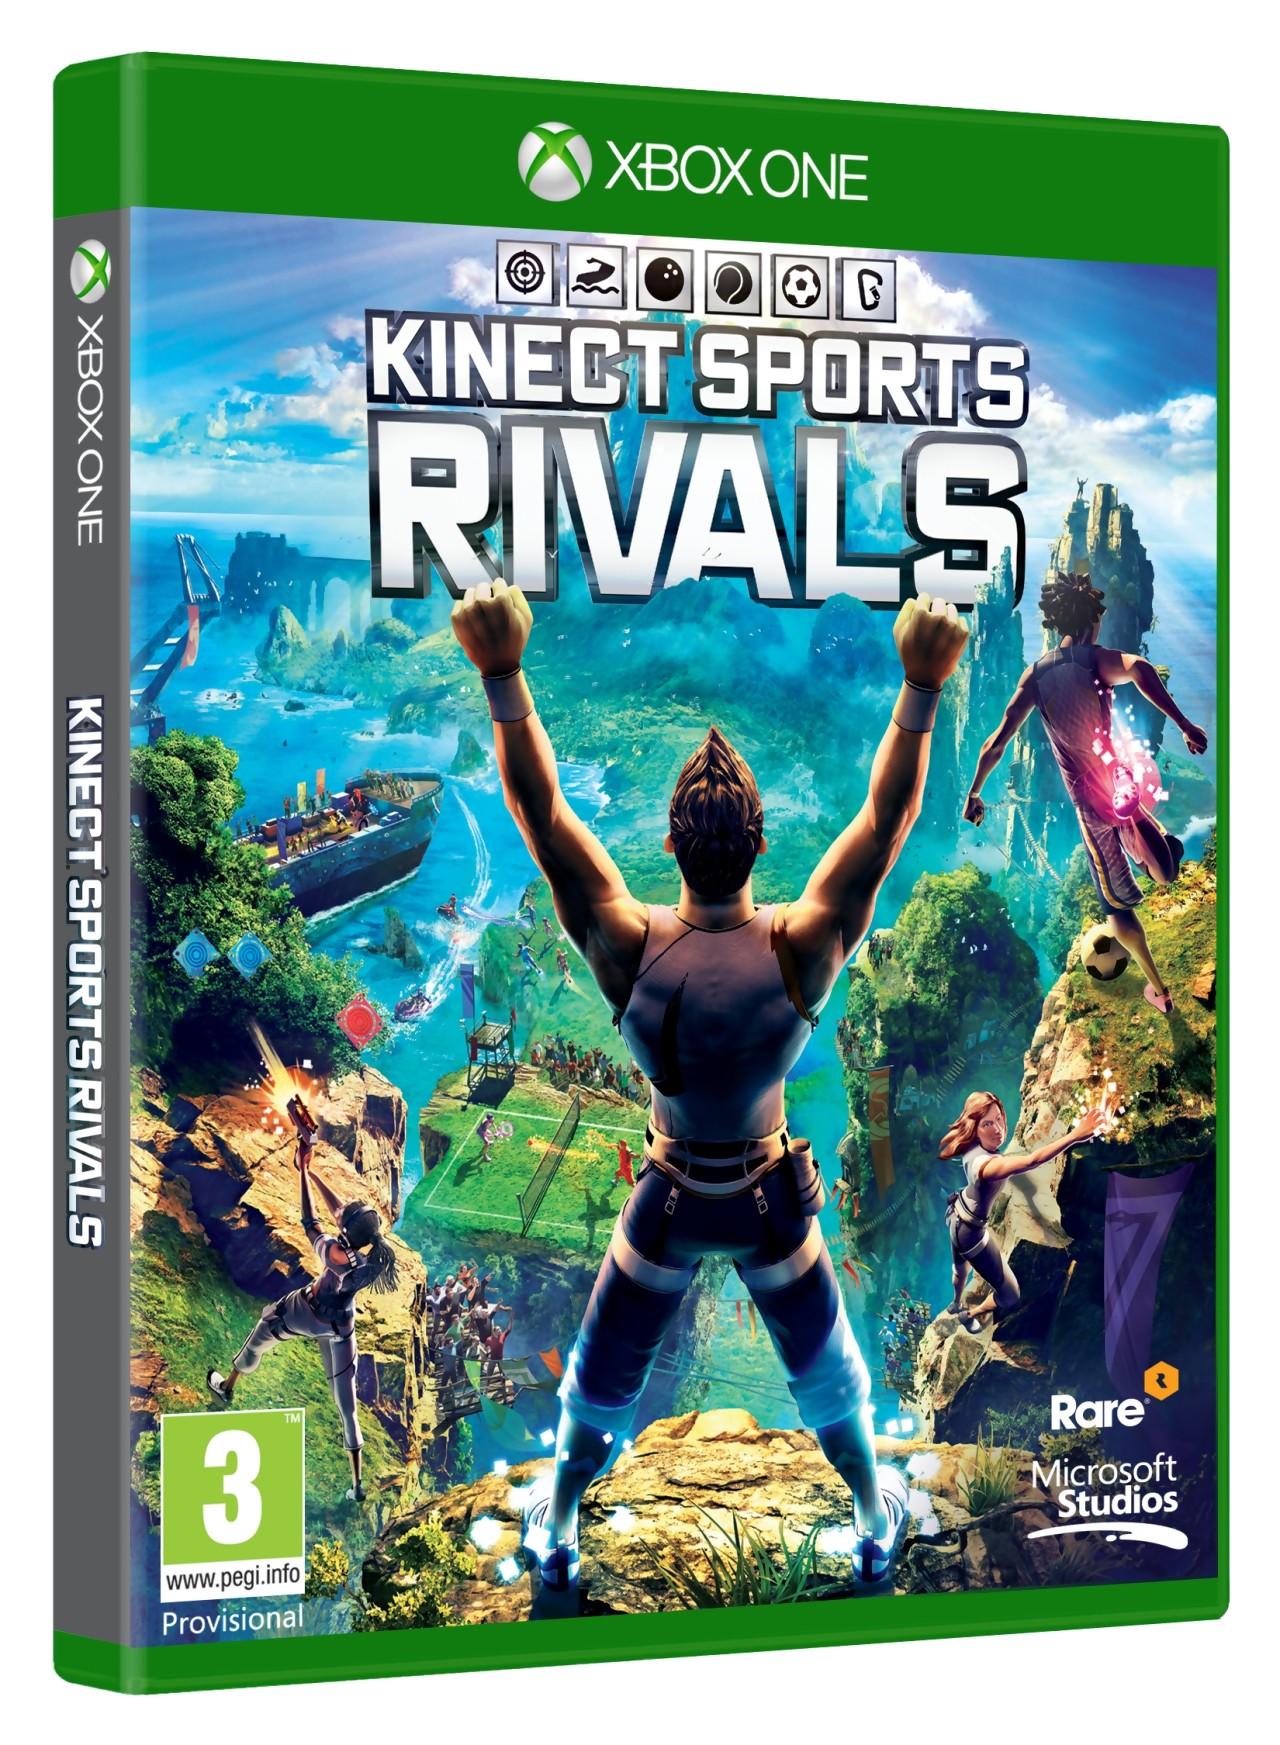 [Image: kinect-sports-rivals-jaqu-53219d7bc6247.jpg]